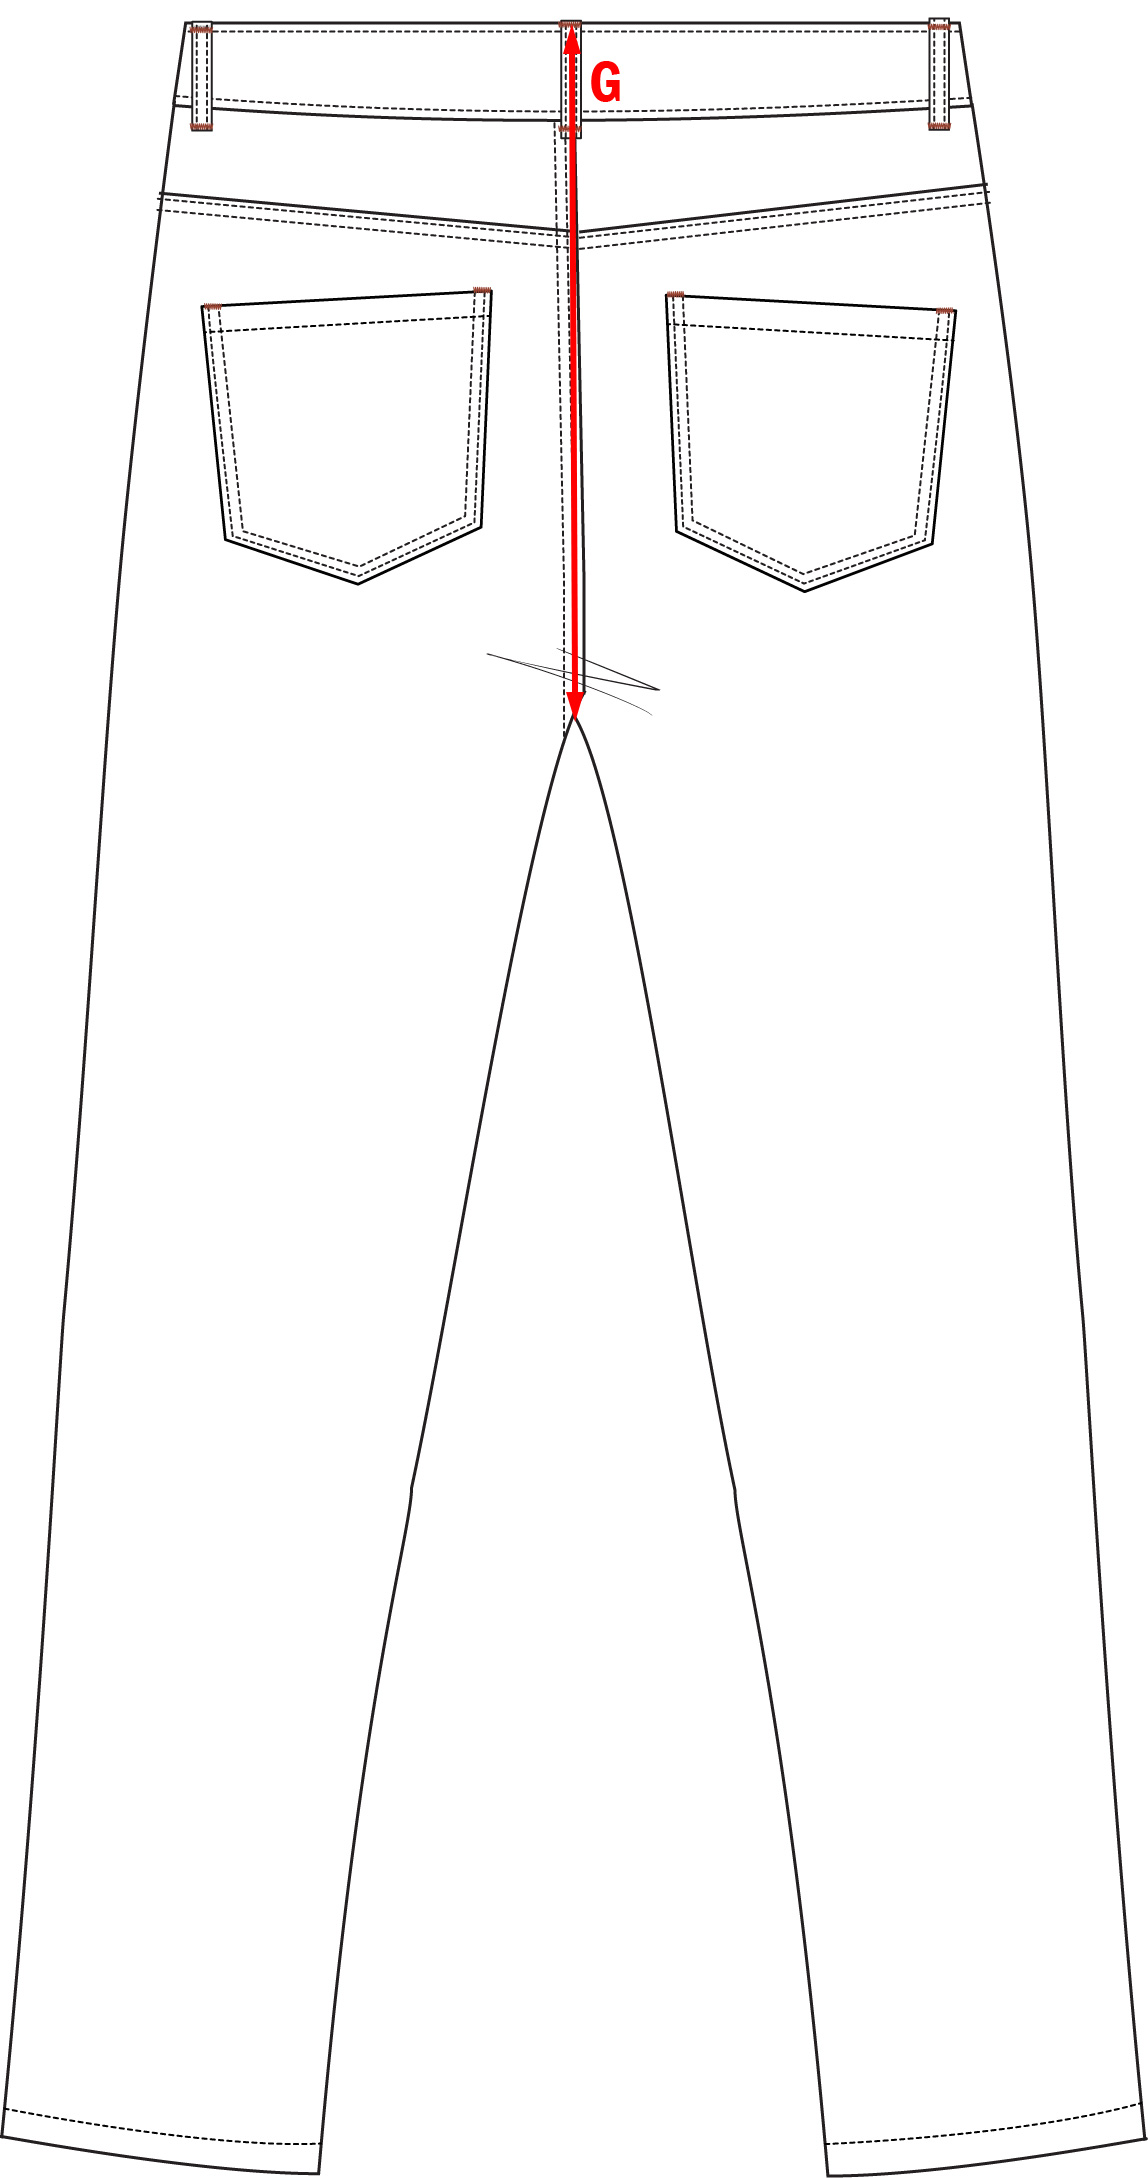 balins-40-pant-cizimi-2.jpg (183 KB)